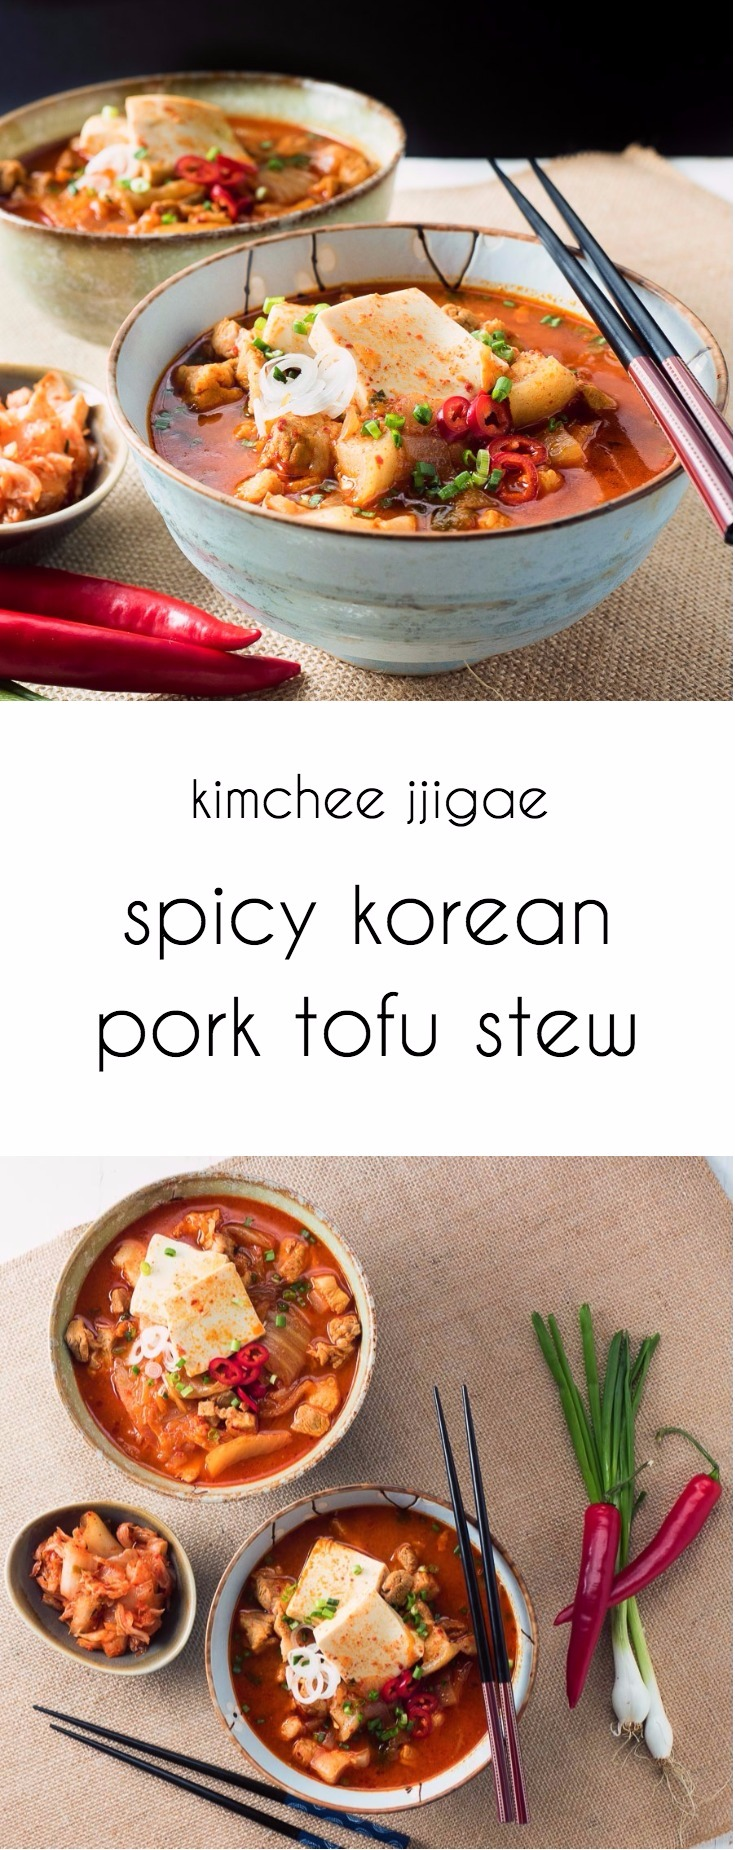 Kimchee jjigae - korean pork stew is a bowl full of spicy, brothy pork goodness.